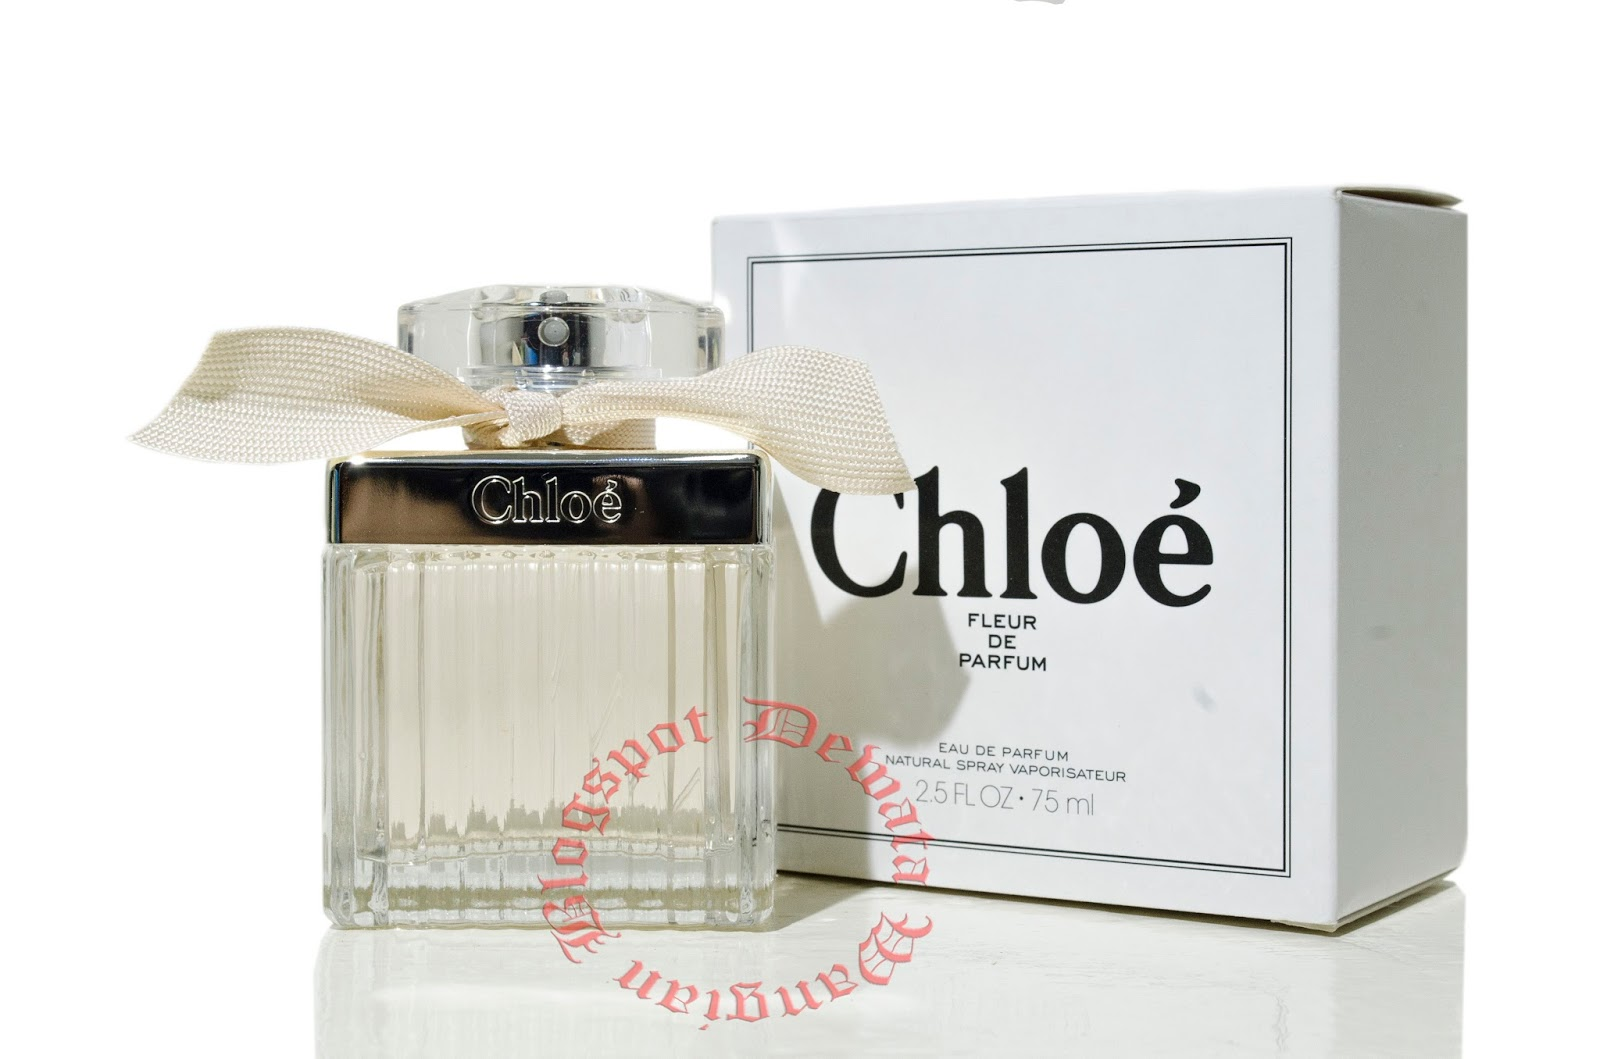 16f9362091c6 Women Edp Tester. Chloé fleur de parfum is a generous bouquet exclusively  composed of the most tender and quintessential part of flowers.